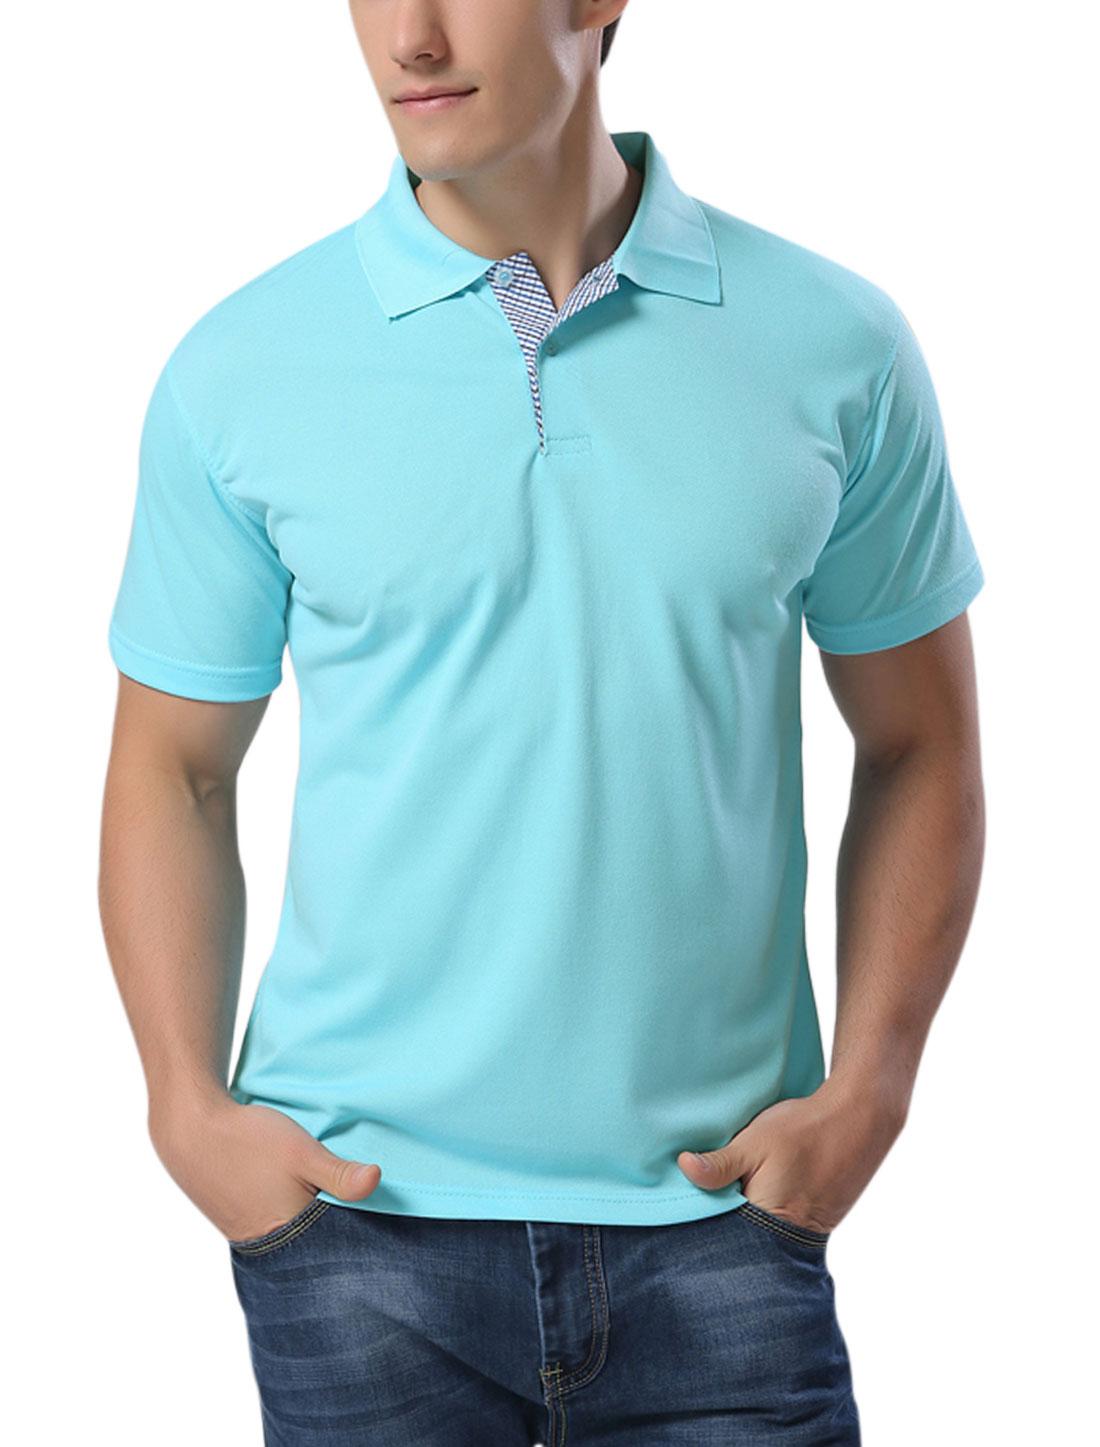 Man Point Collar Short Sleeves Leisure Polo Shirts Aqua L